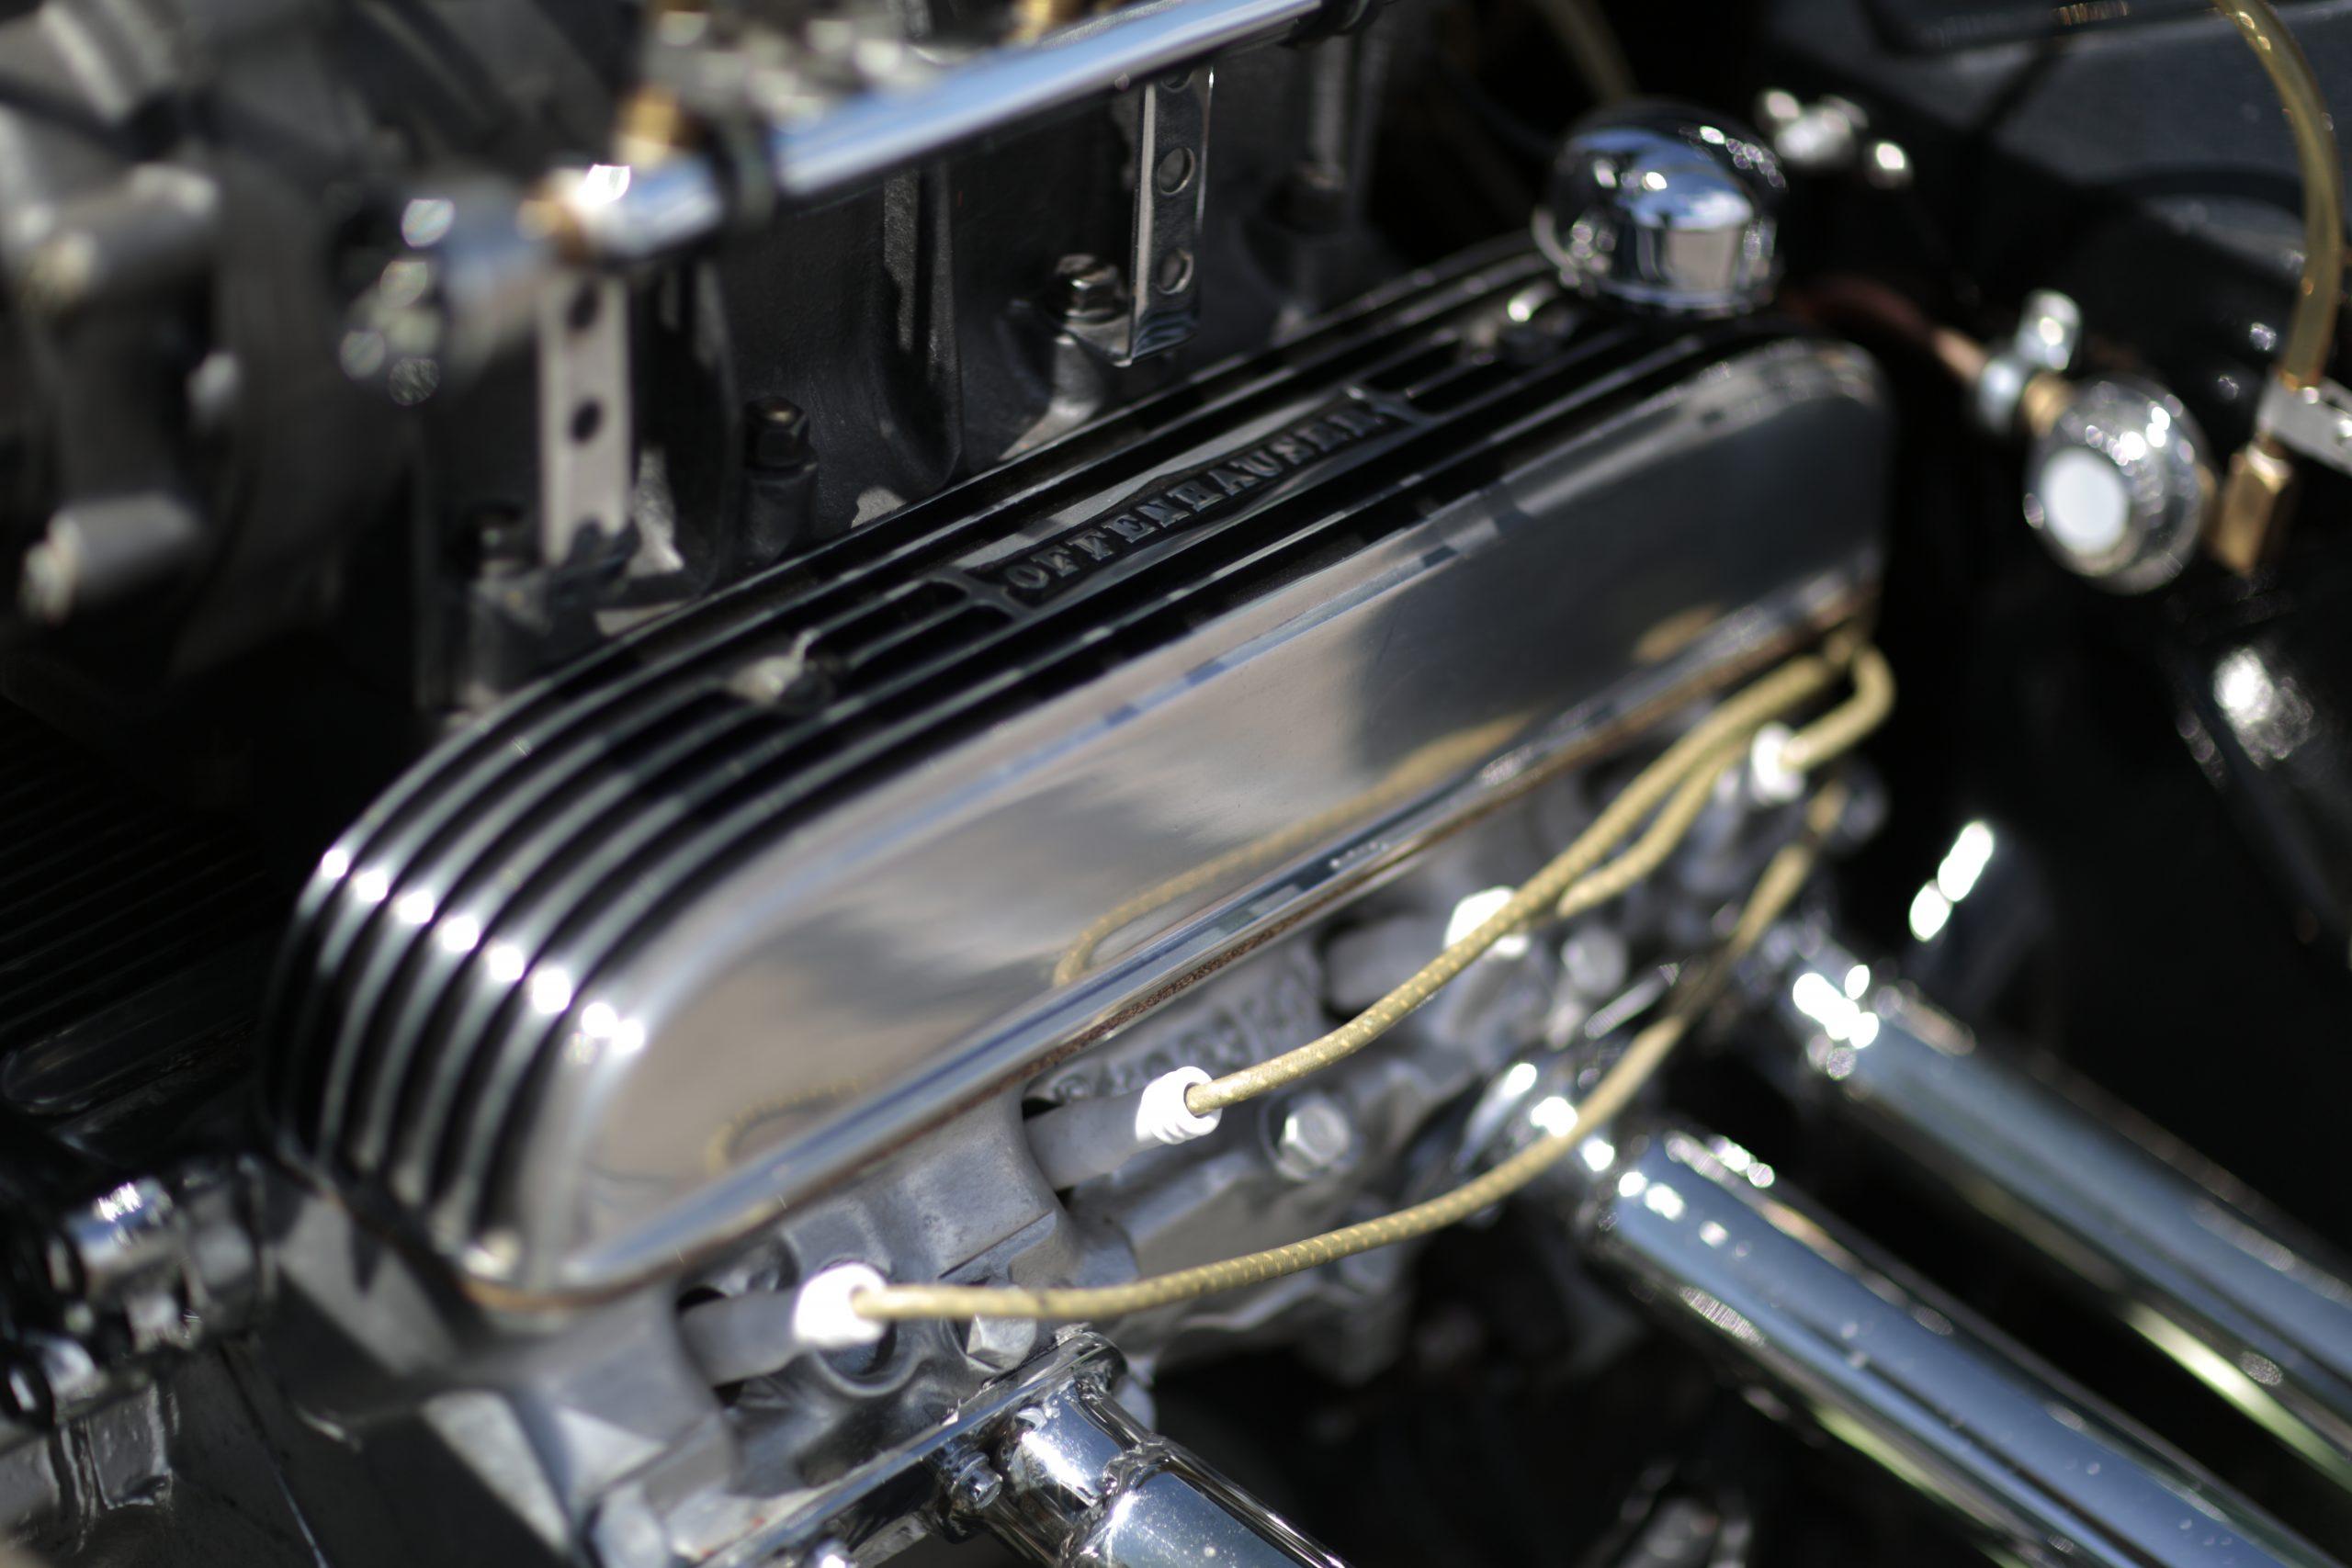 Buick nailhead valve cover Offenhauser